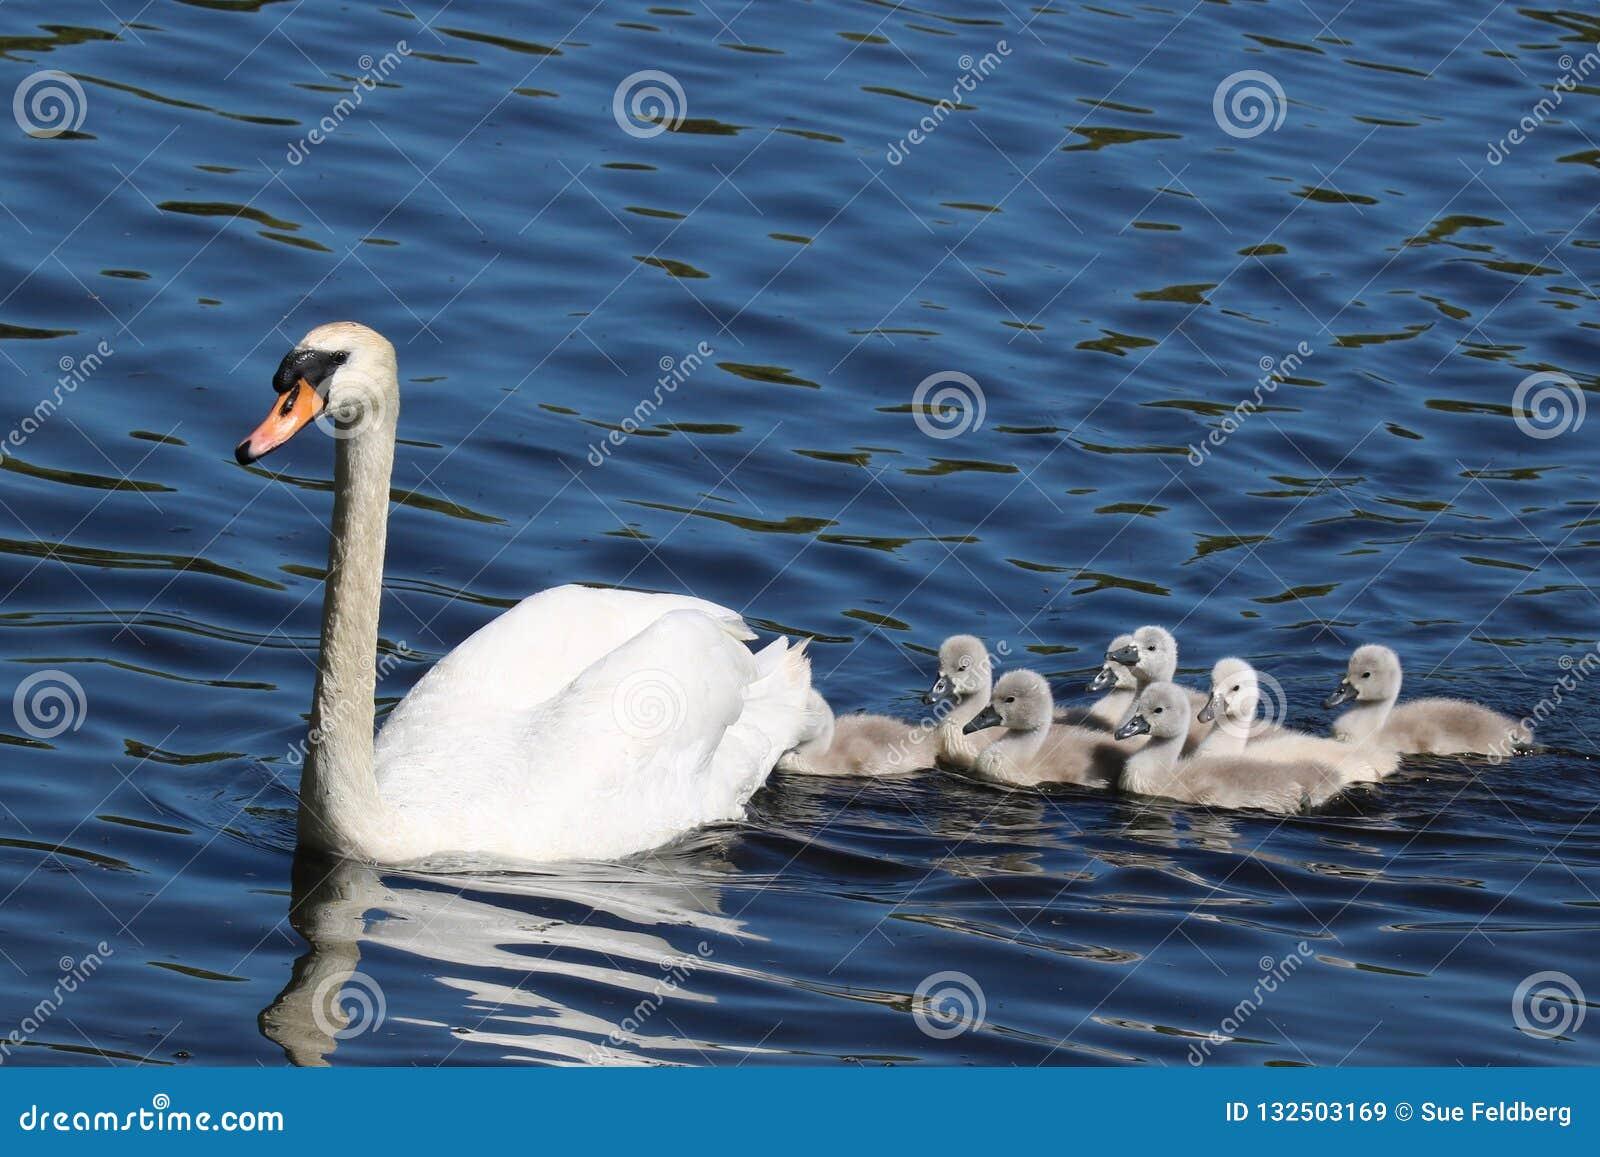 Natation de cygne avec des jeunes cygnes